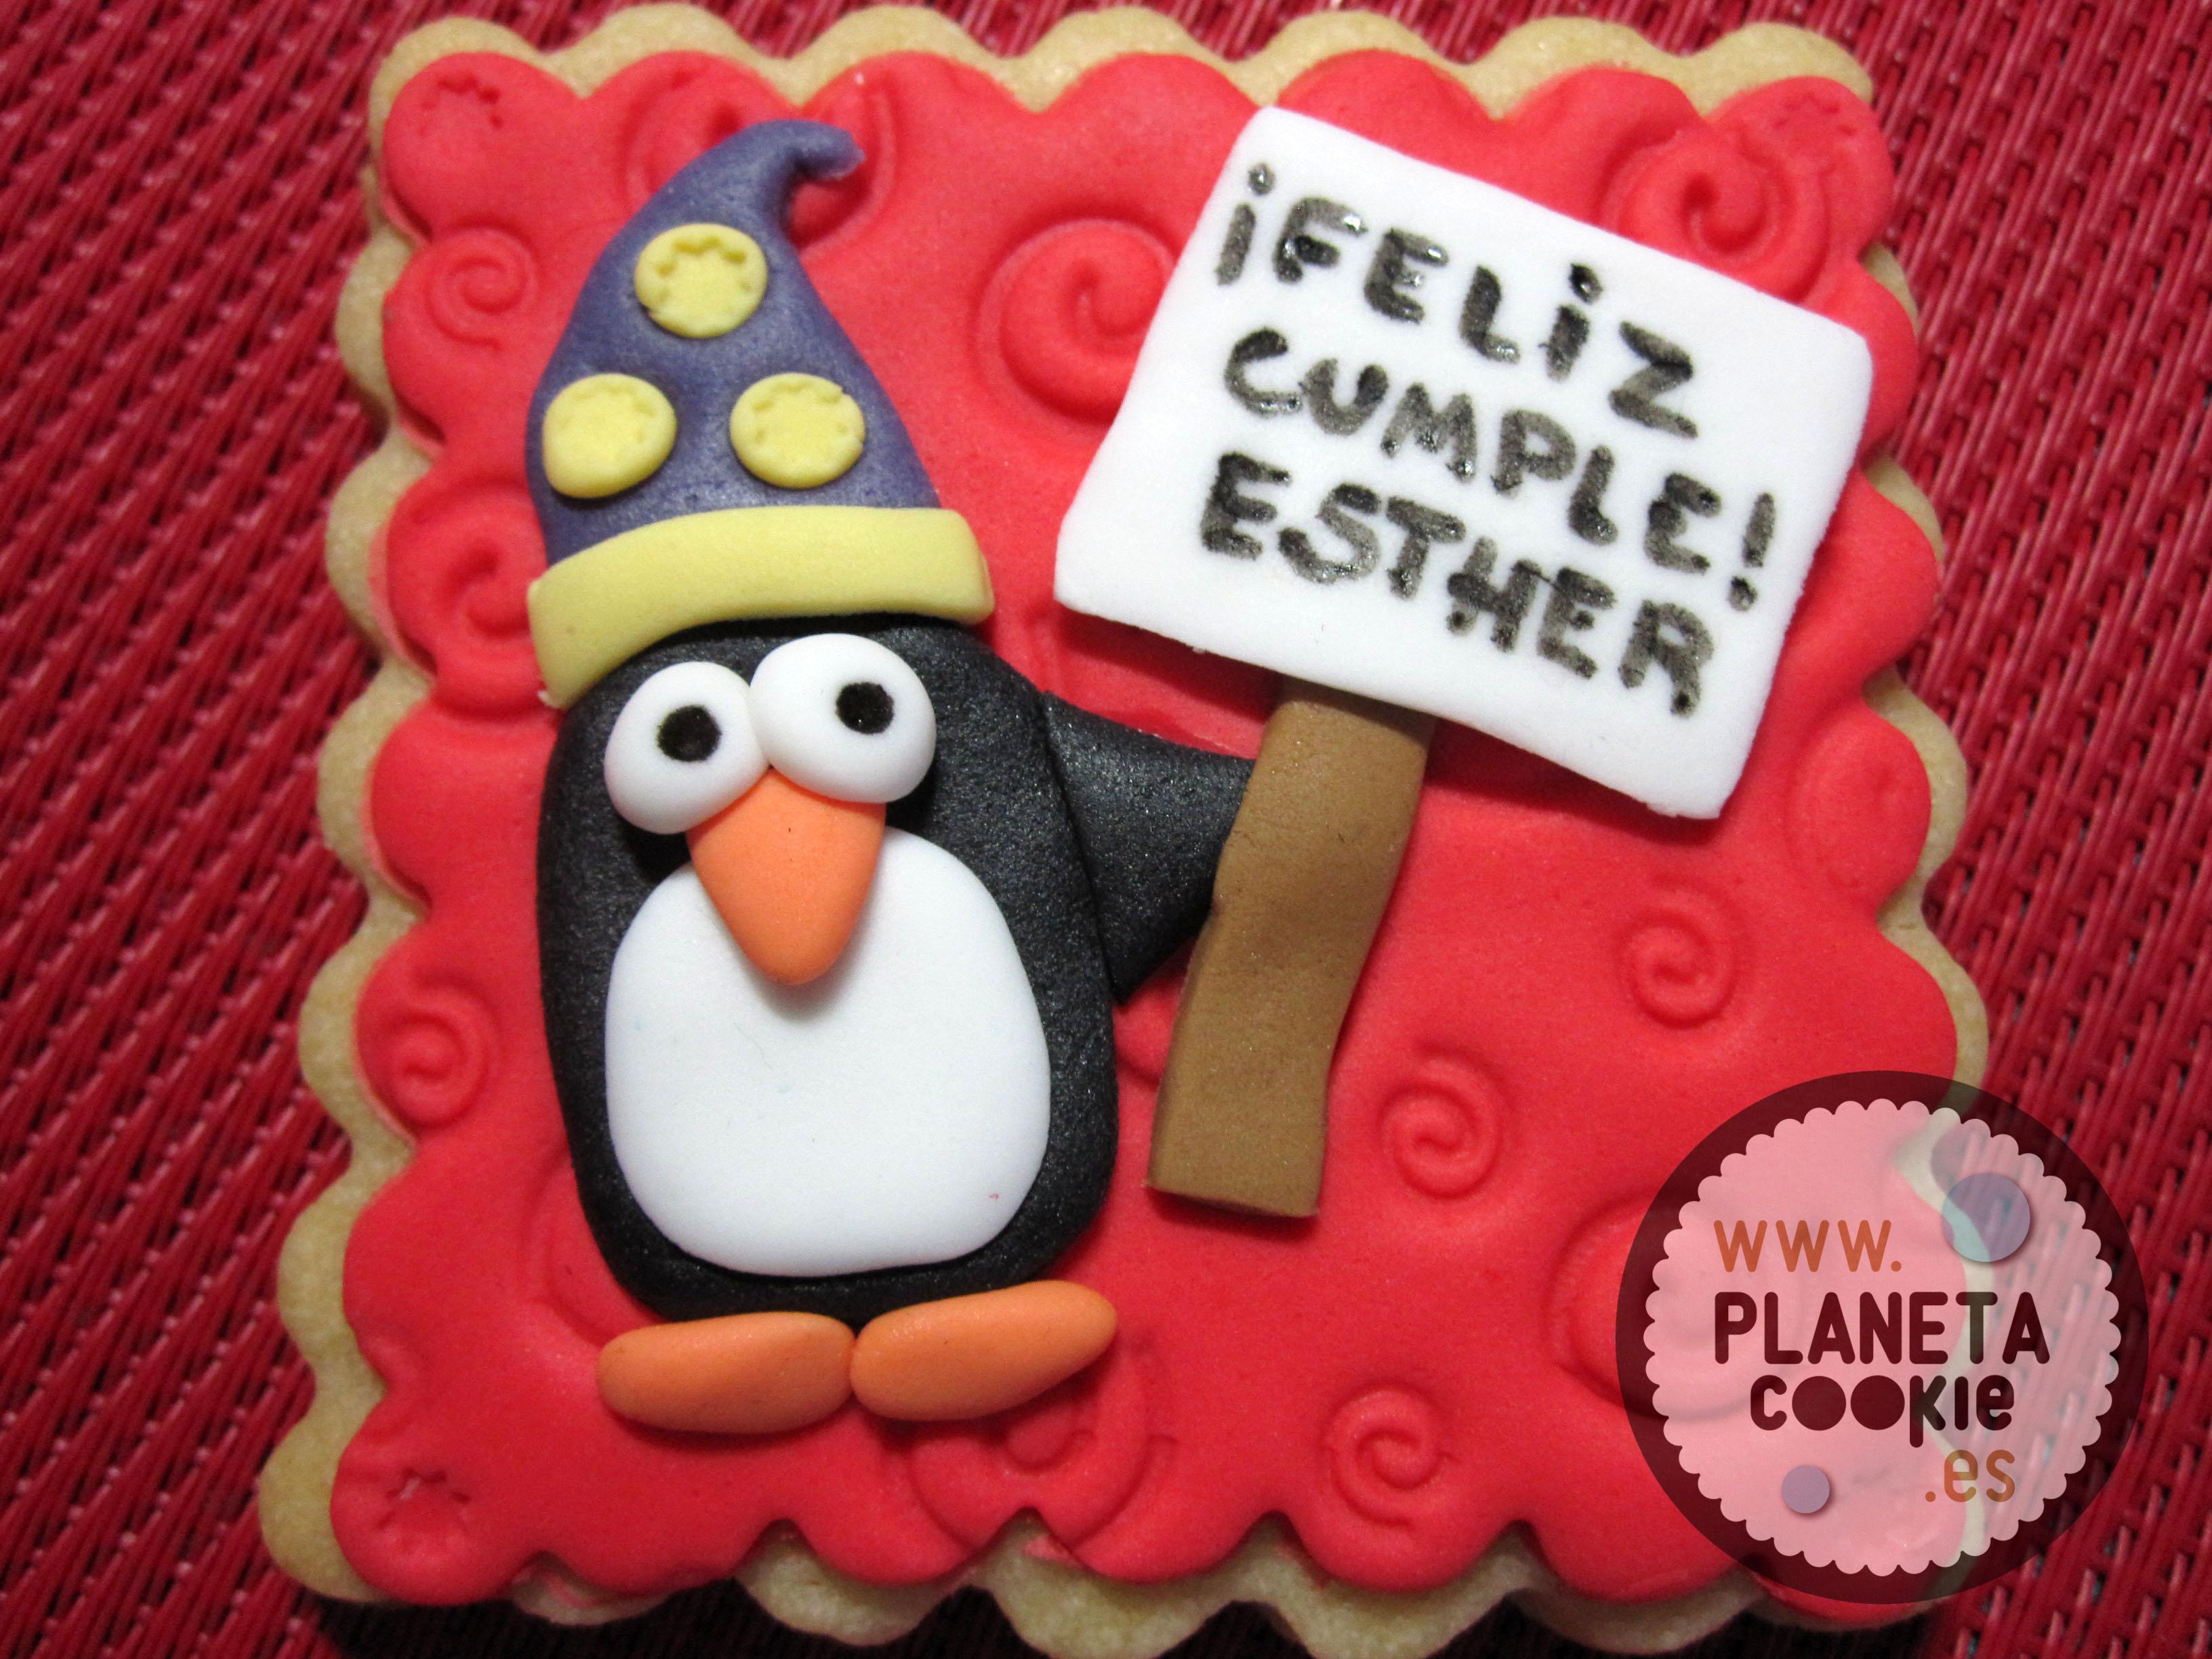 IMG_2986ed | Planeta Cookie Harrypotter